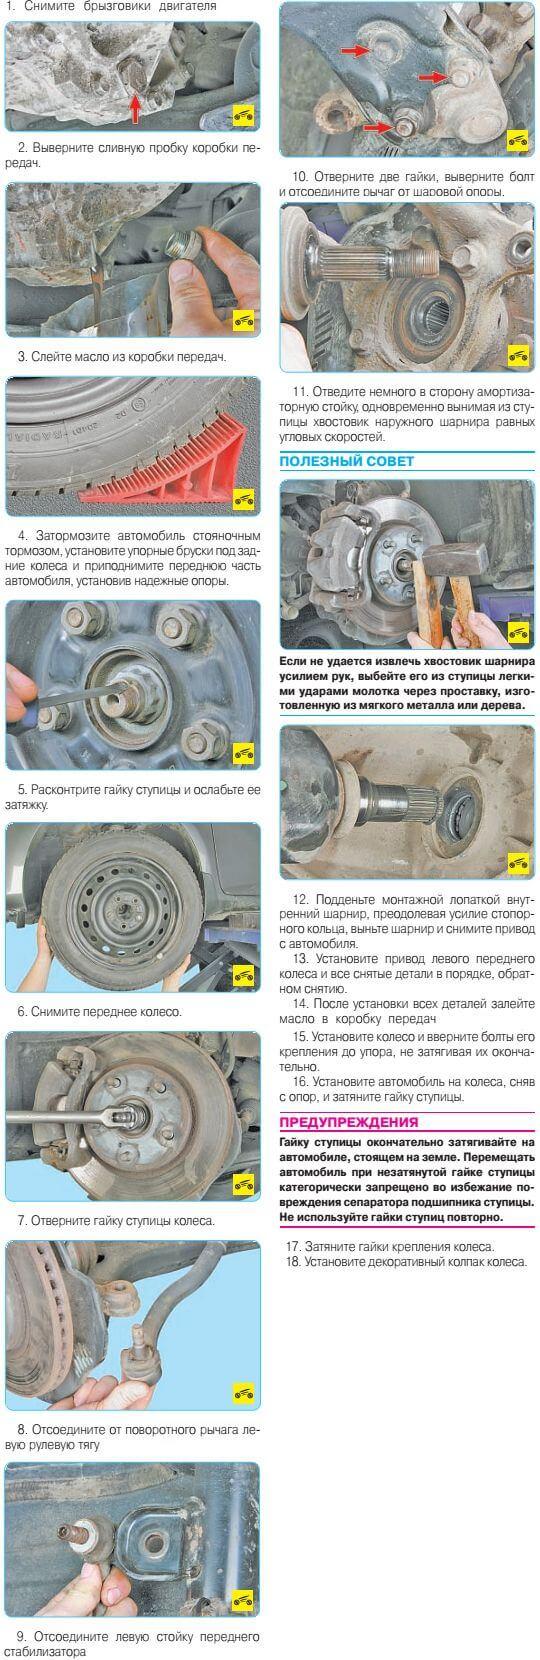 Замена переднего привода колеса Королла